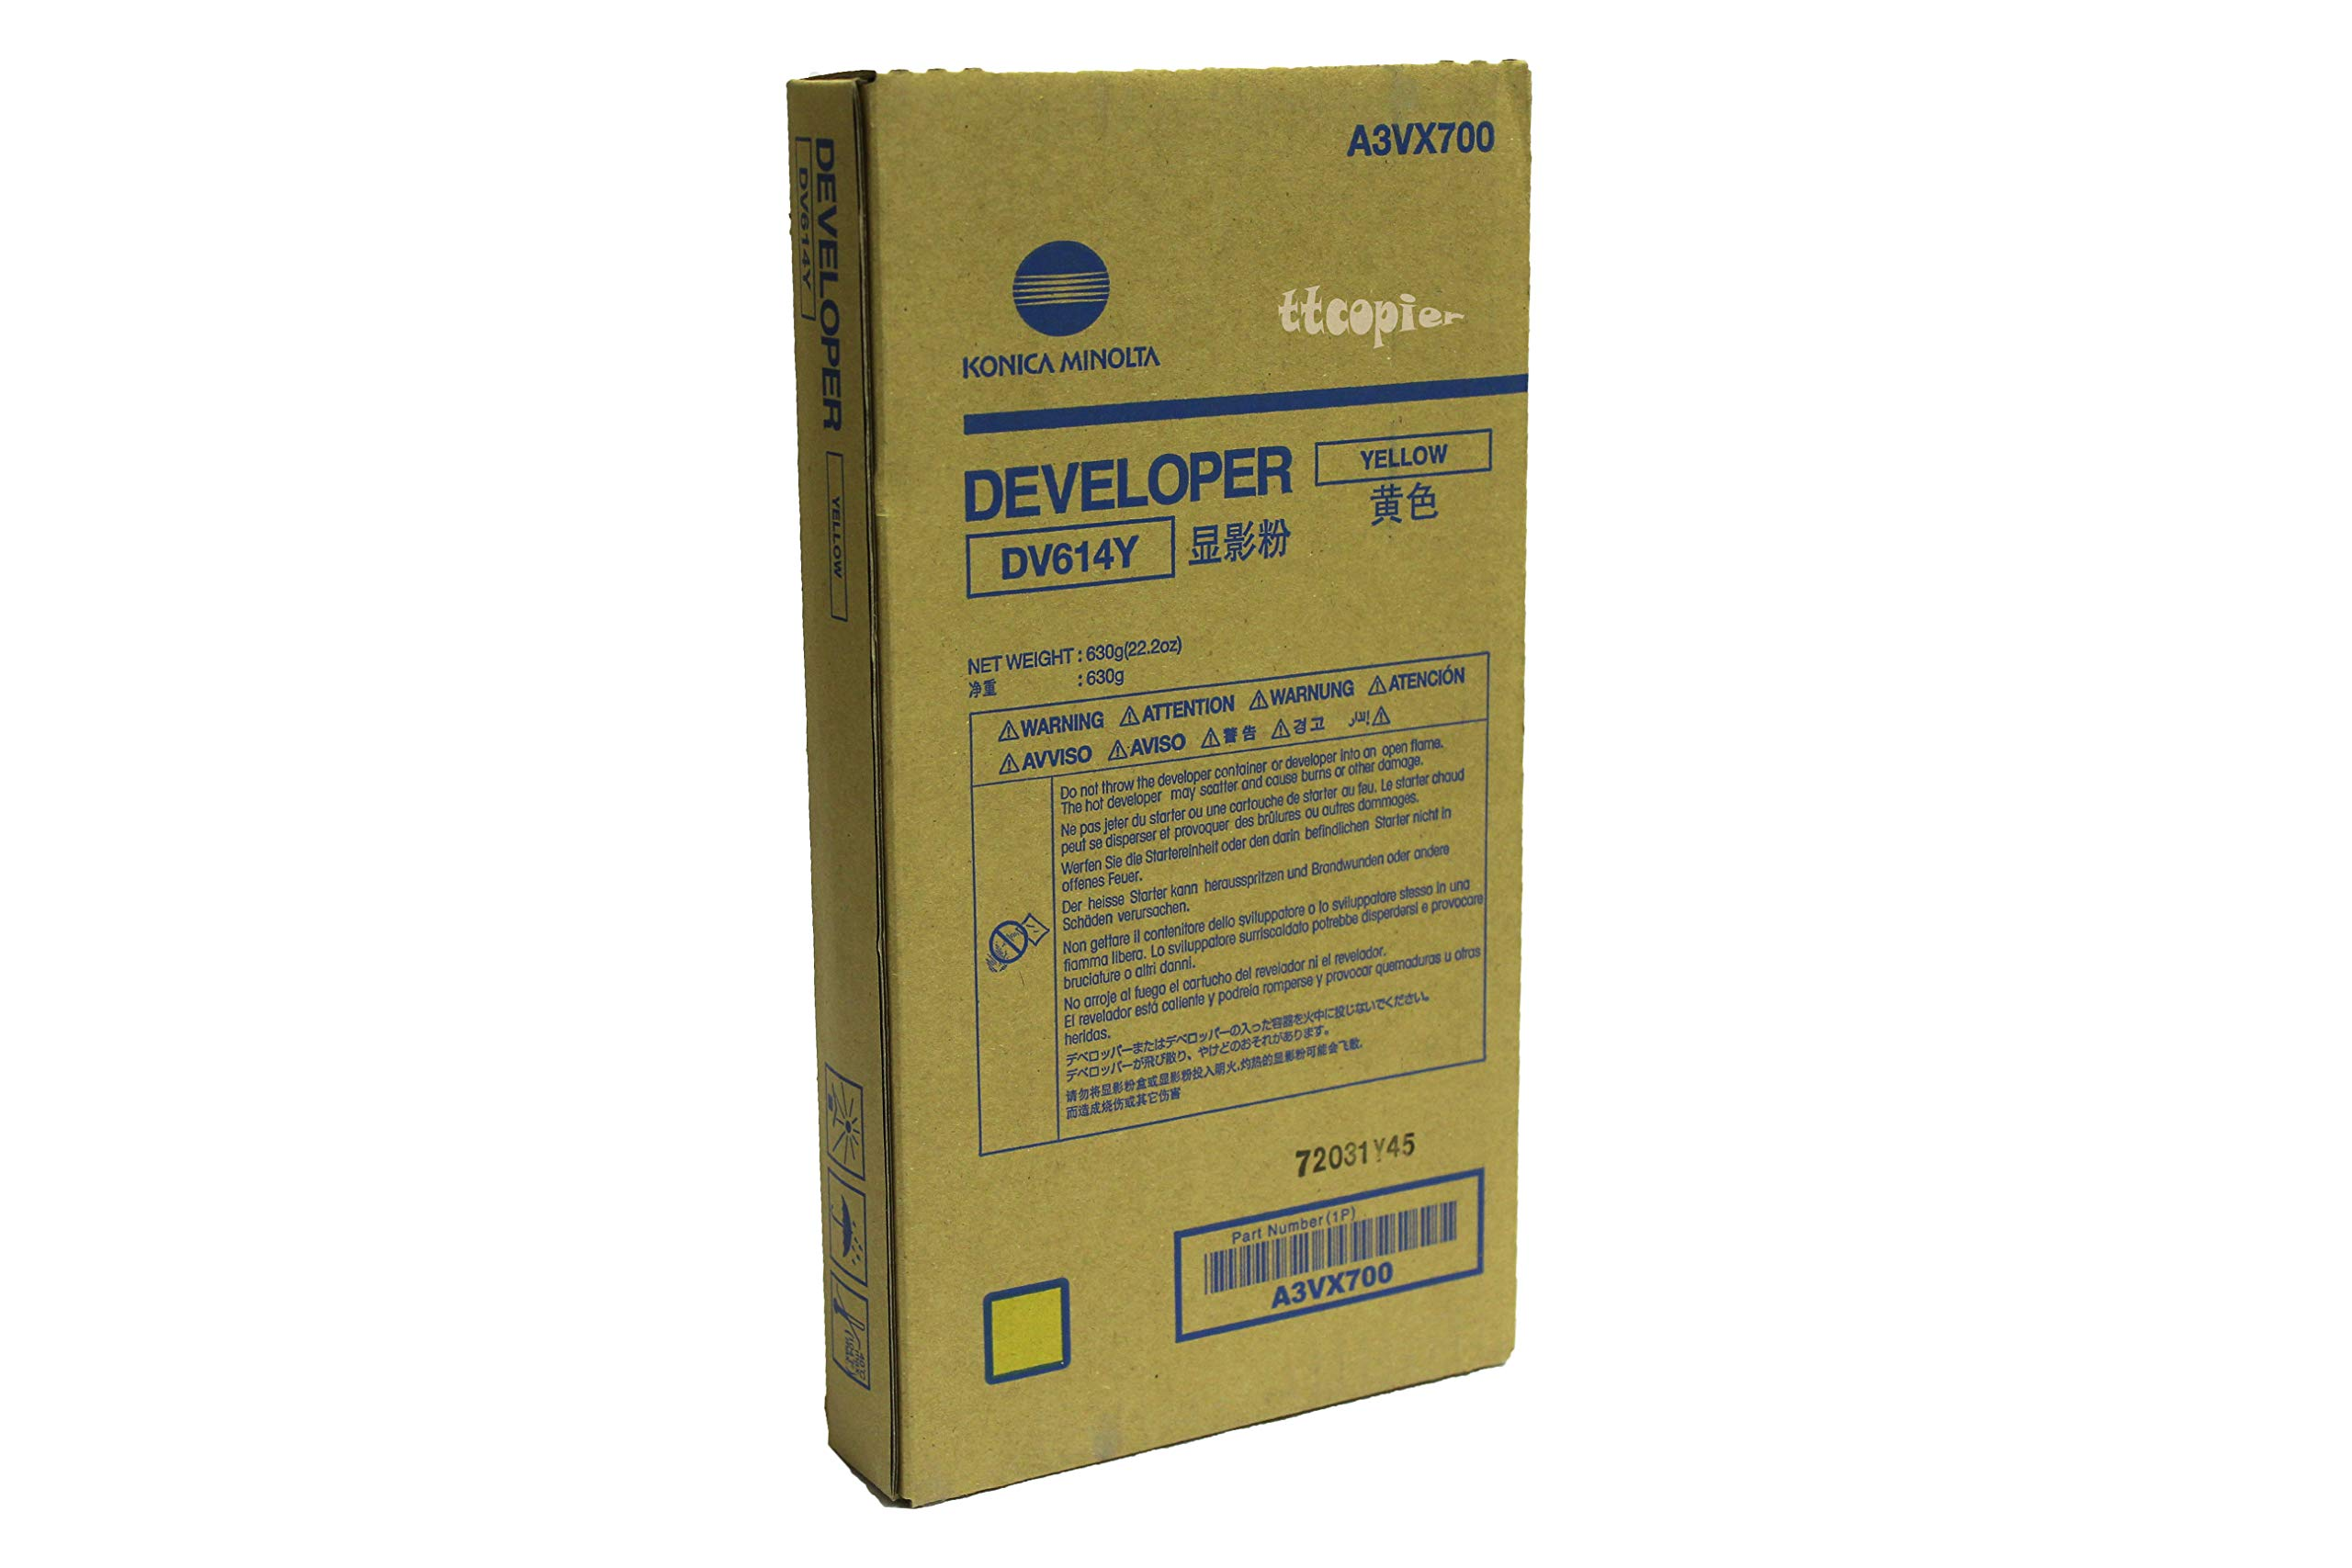 Genuine Konica Minolta A3VX700 DV614Y Yellow Developer for C1060 C1070